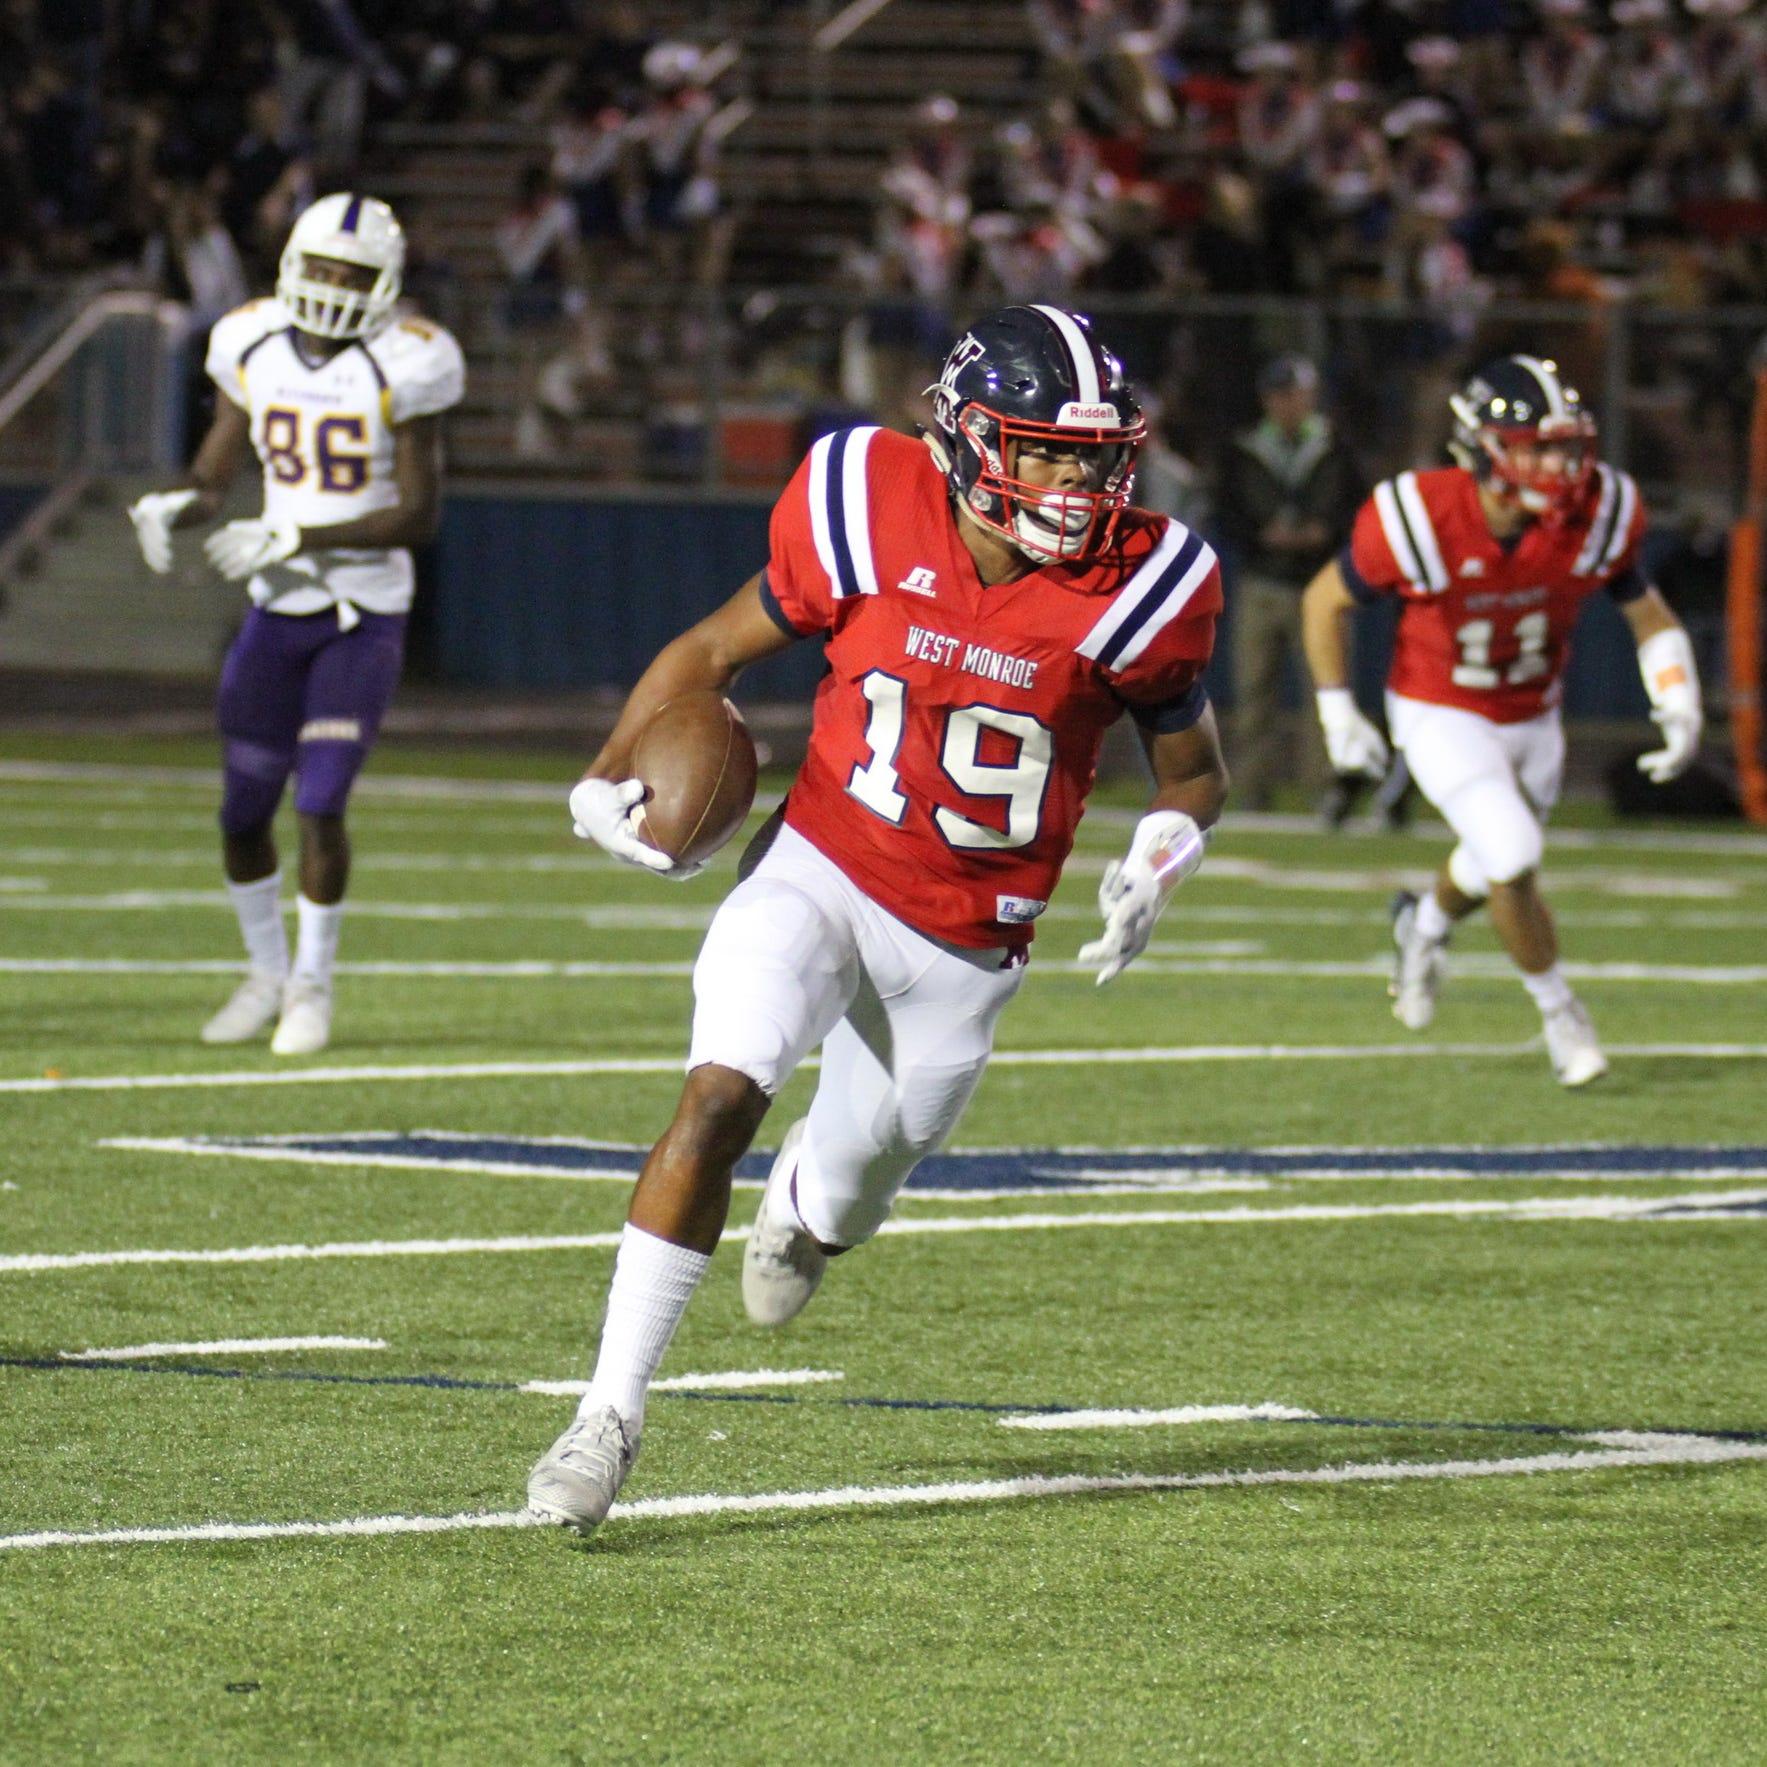 West Monroe senior cornerback Nobie Harris (19) returns an interception back for a touchdown against Alexandria Friday night at Rebel Stadium.